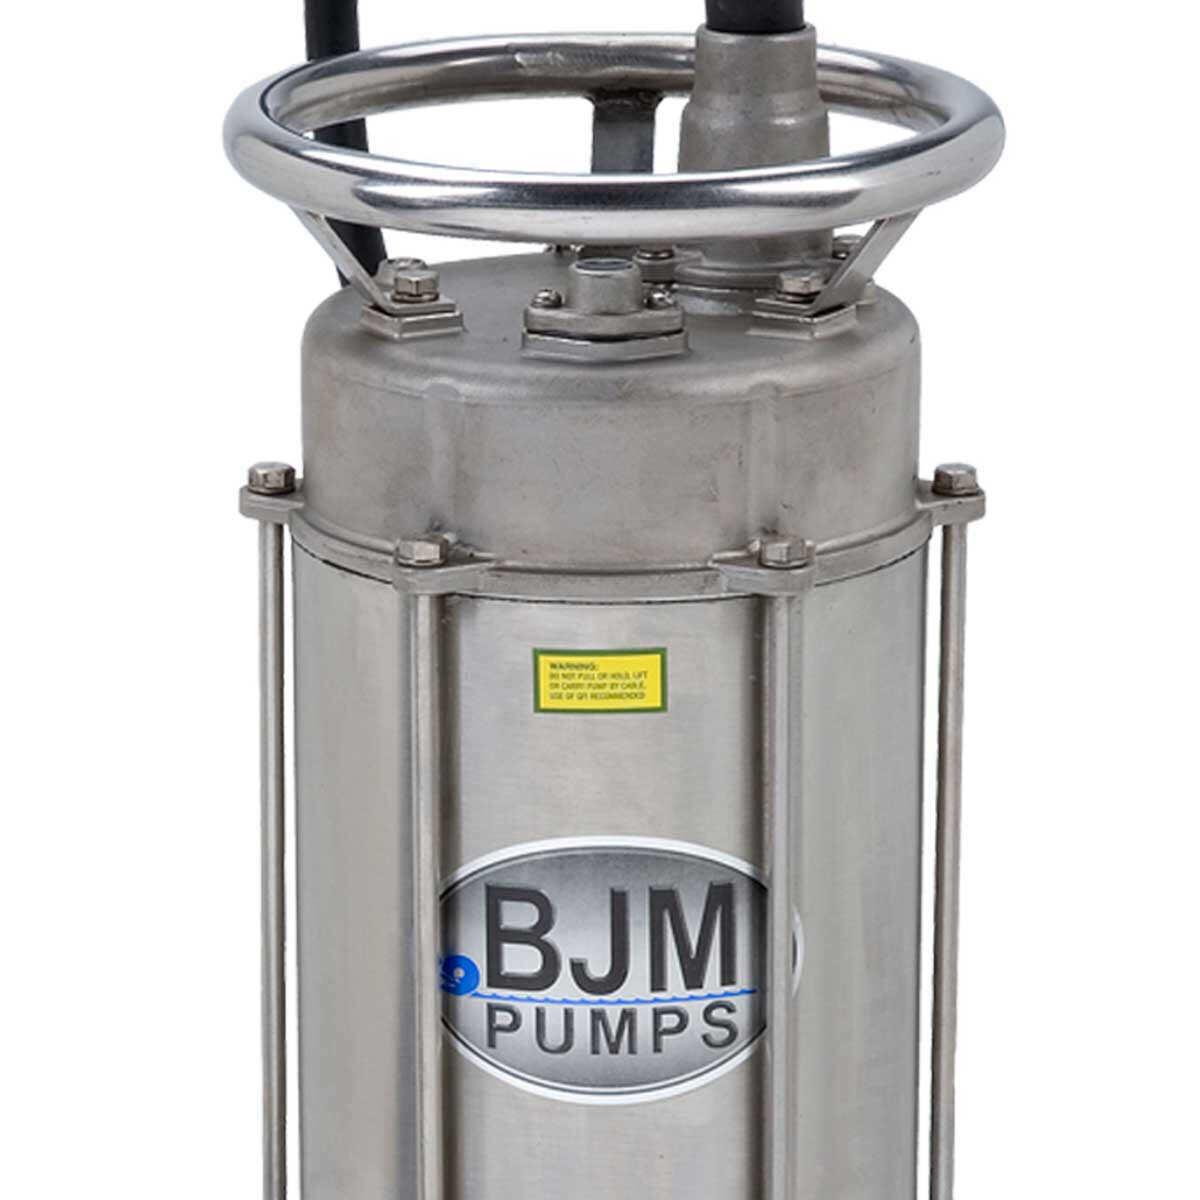 BJM JX750SS-115 Stainless Steel Pump